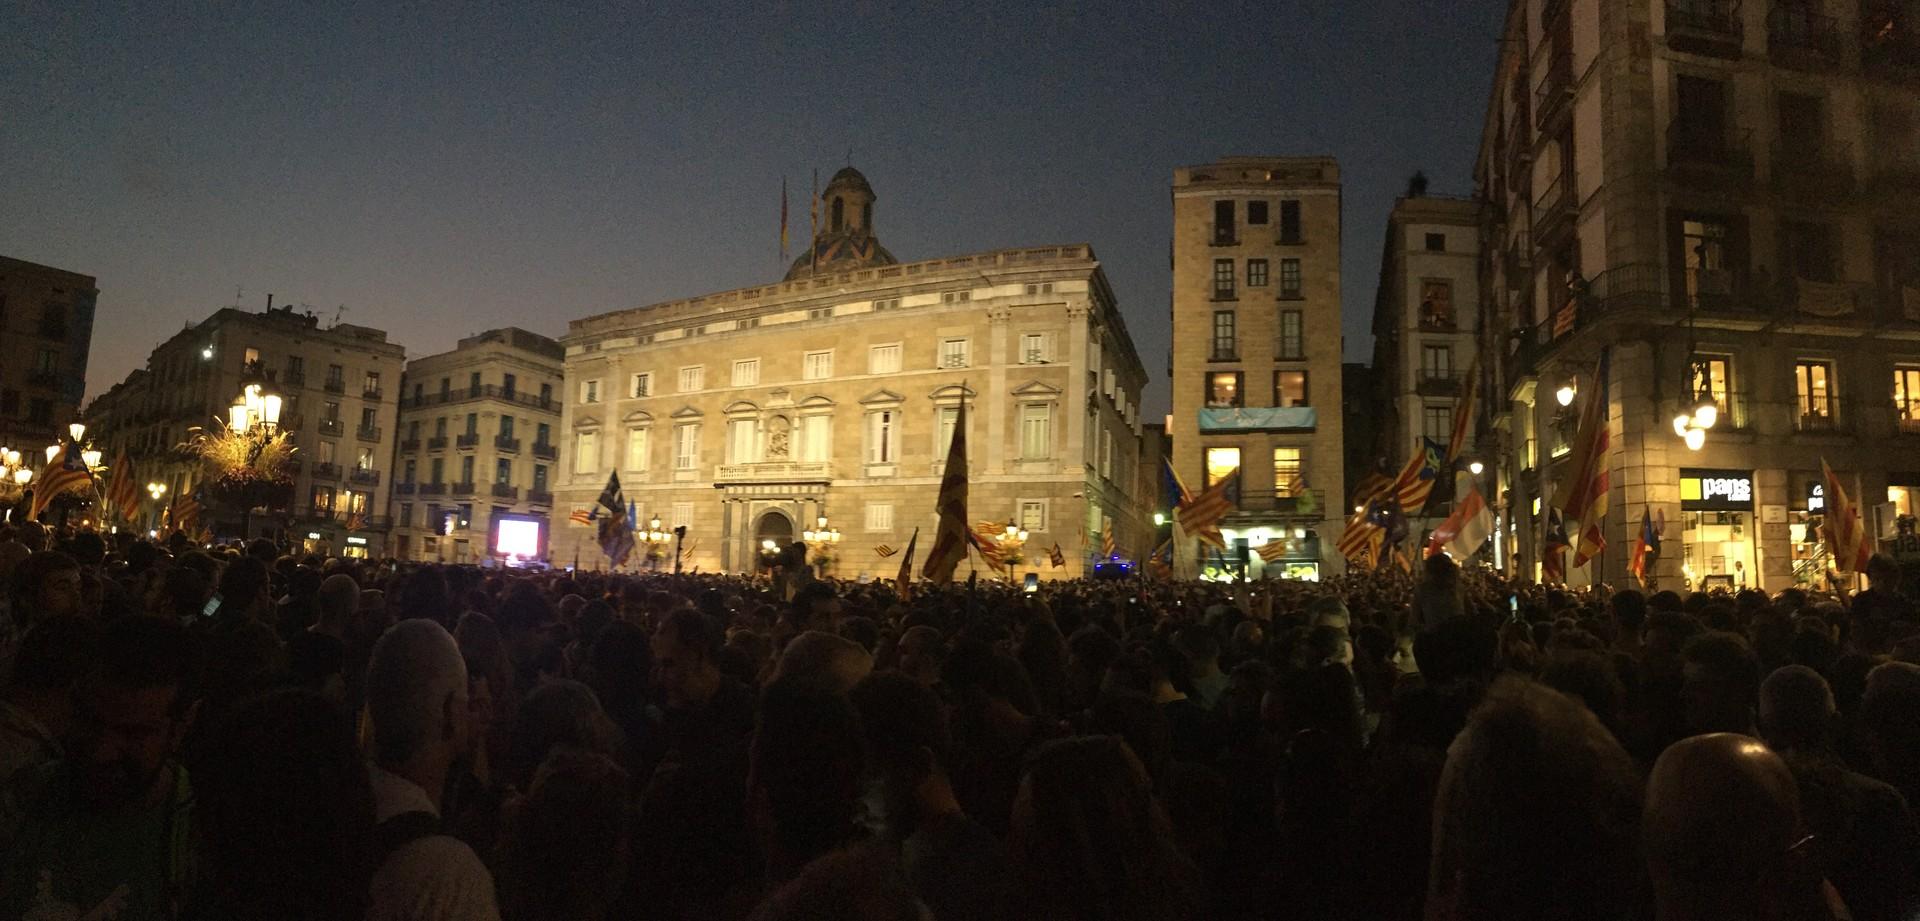 oficial square